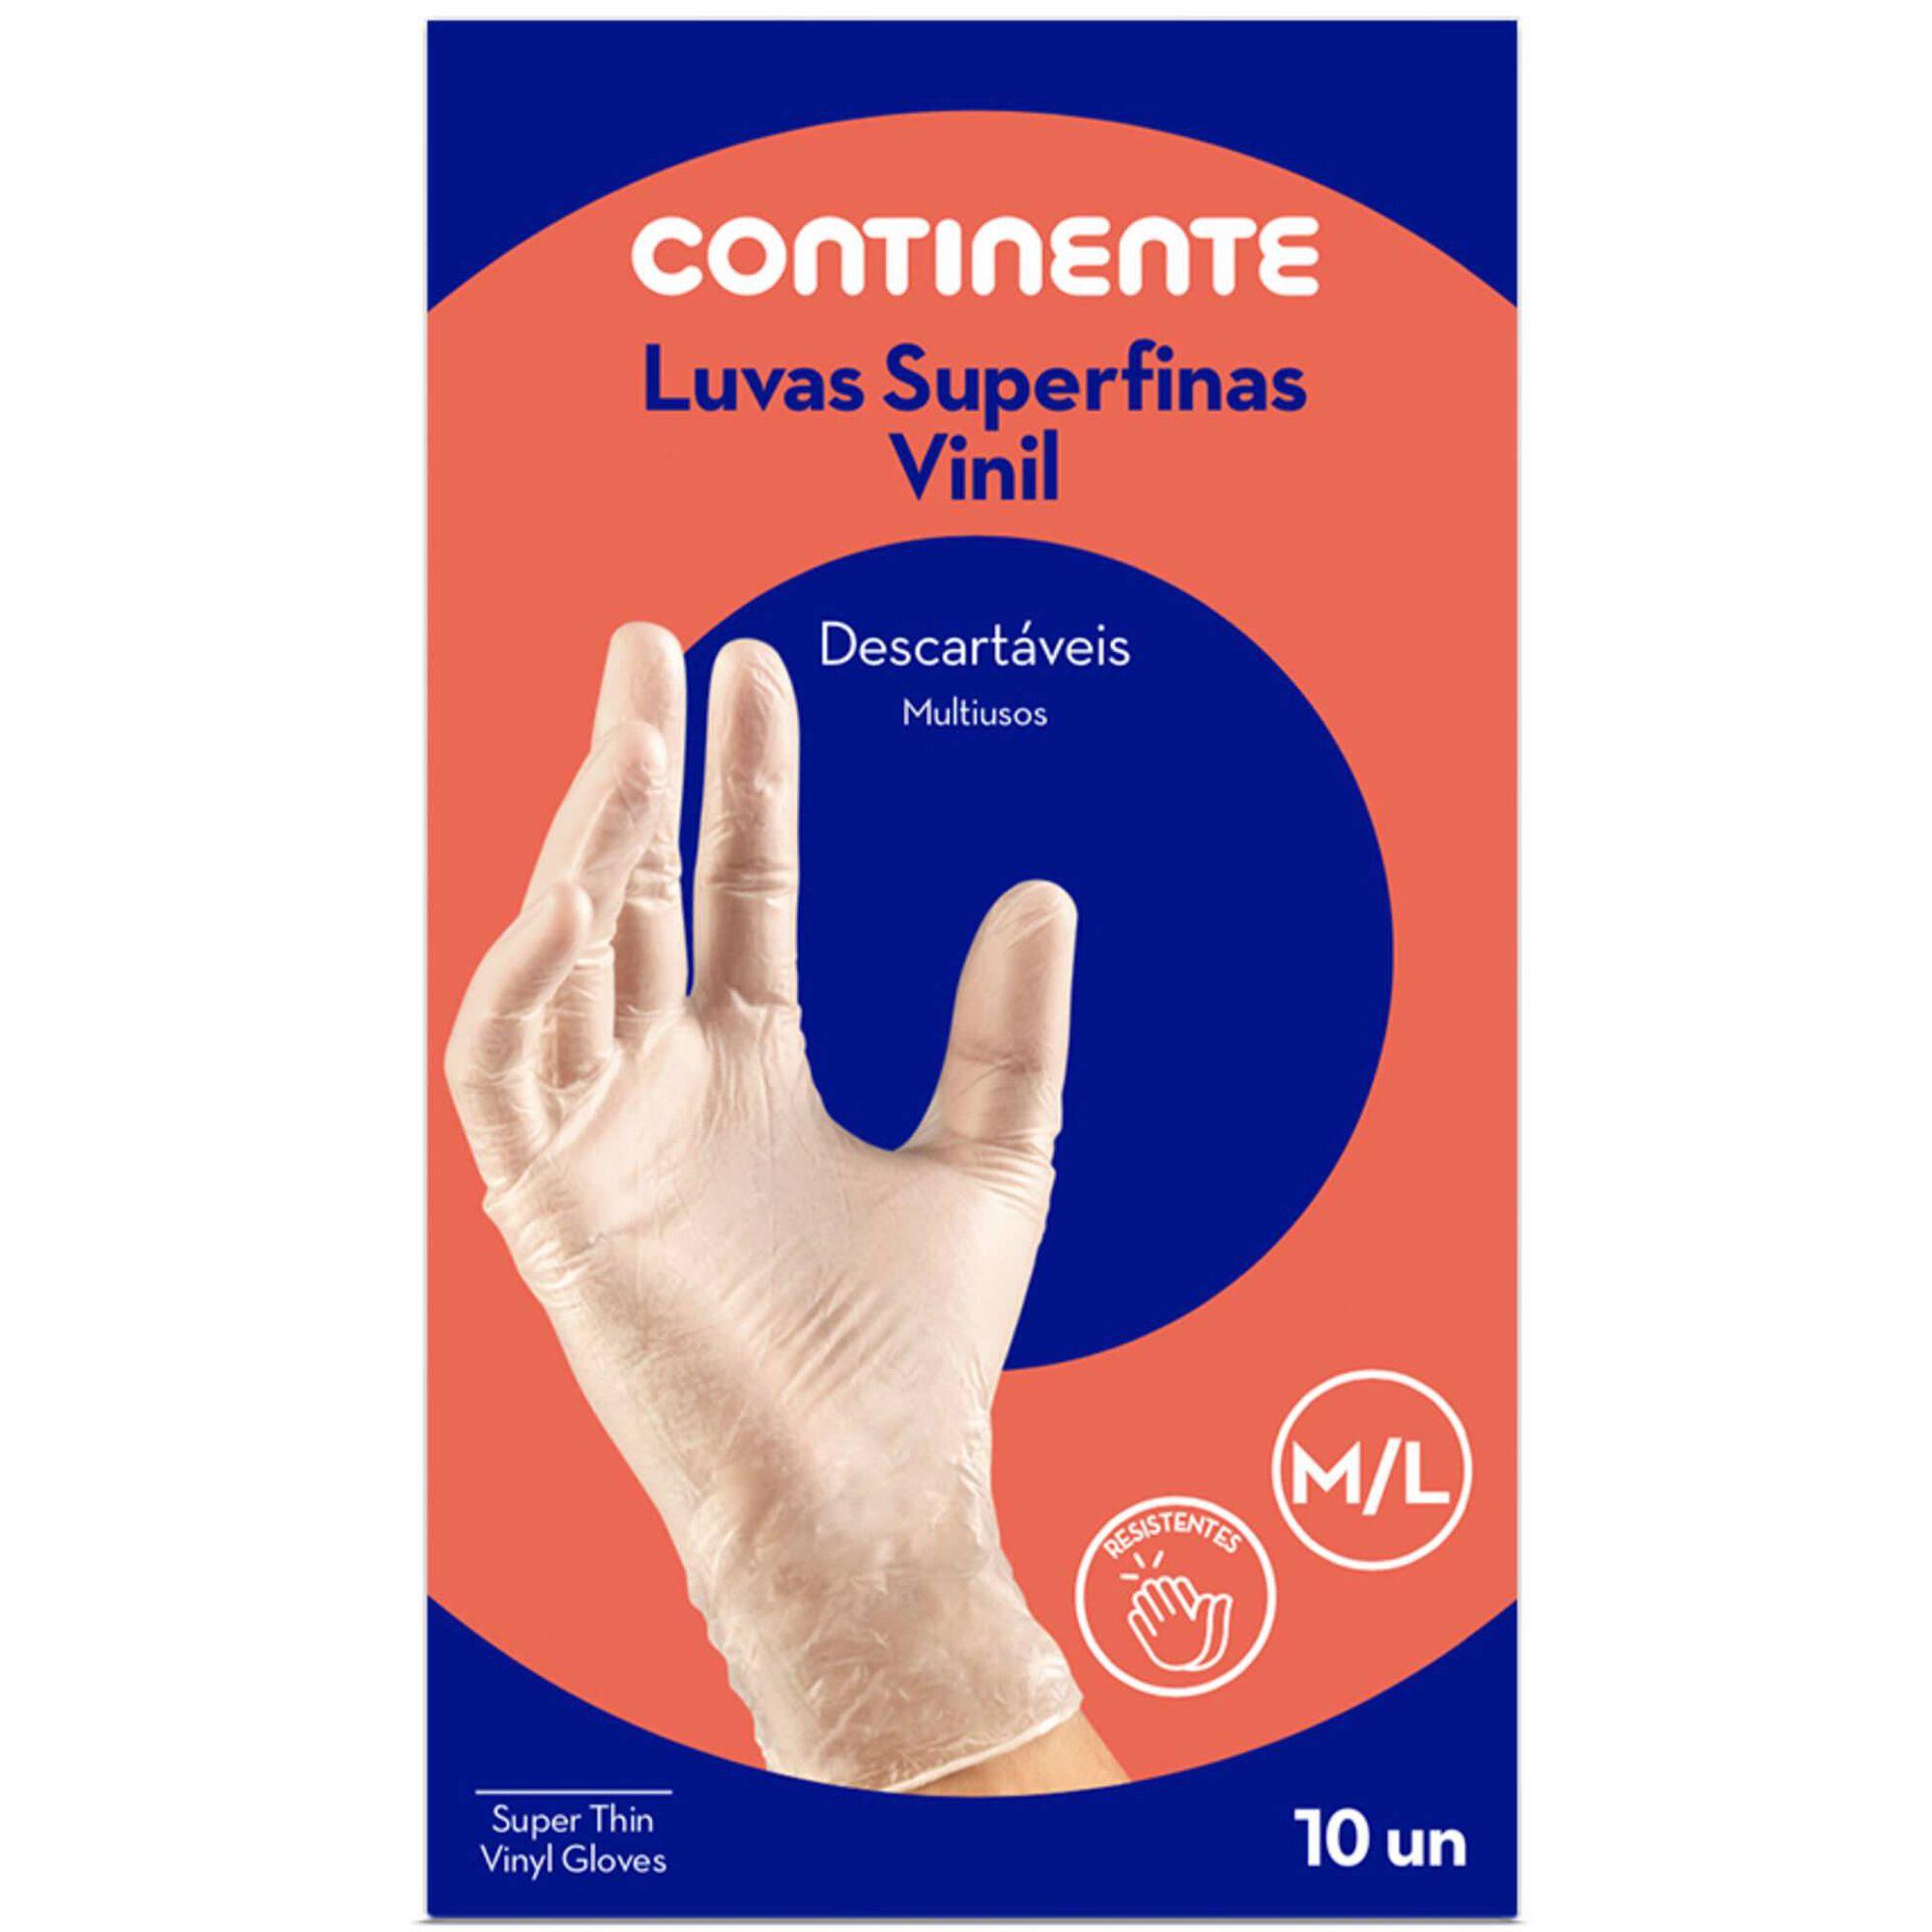 Luvas Descartáveis Superfinas Vinil Tam. M/L